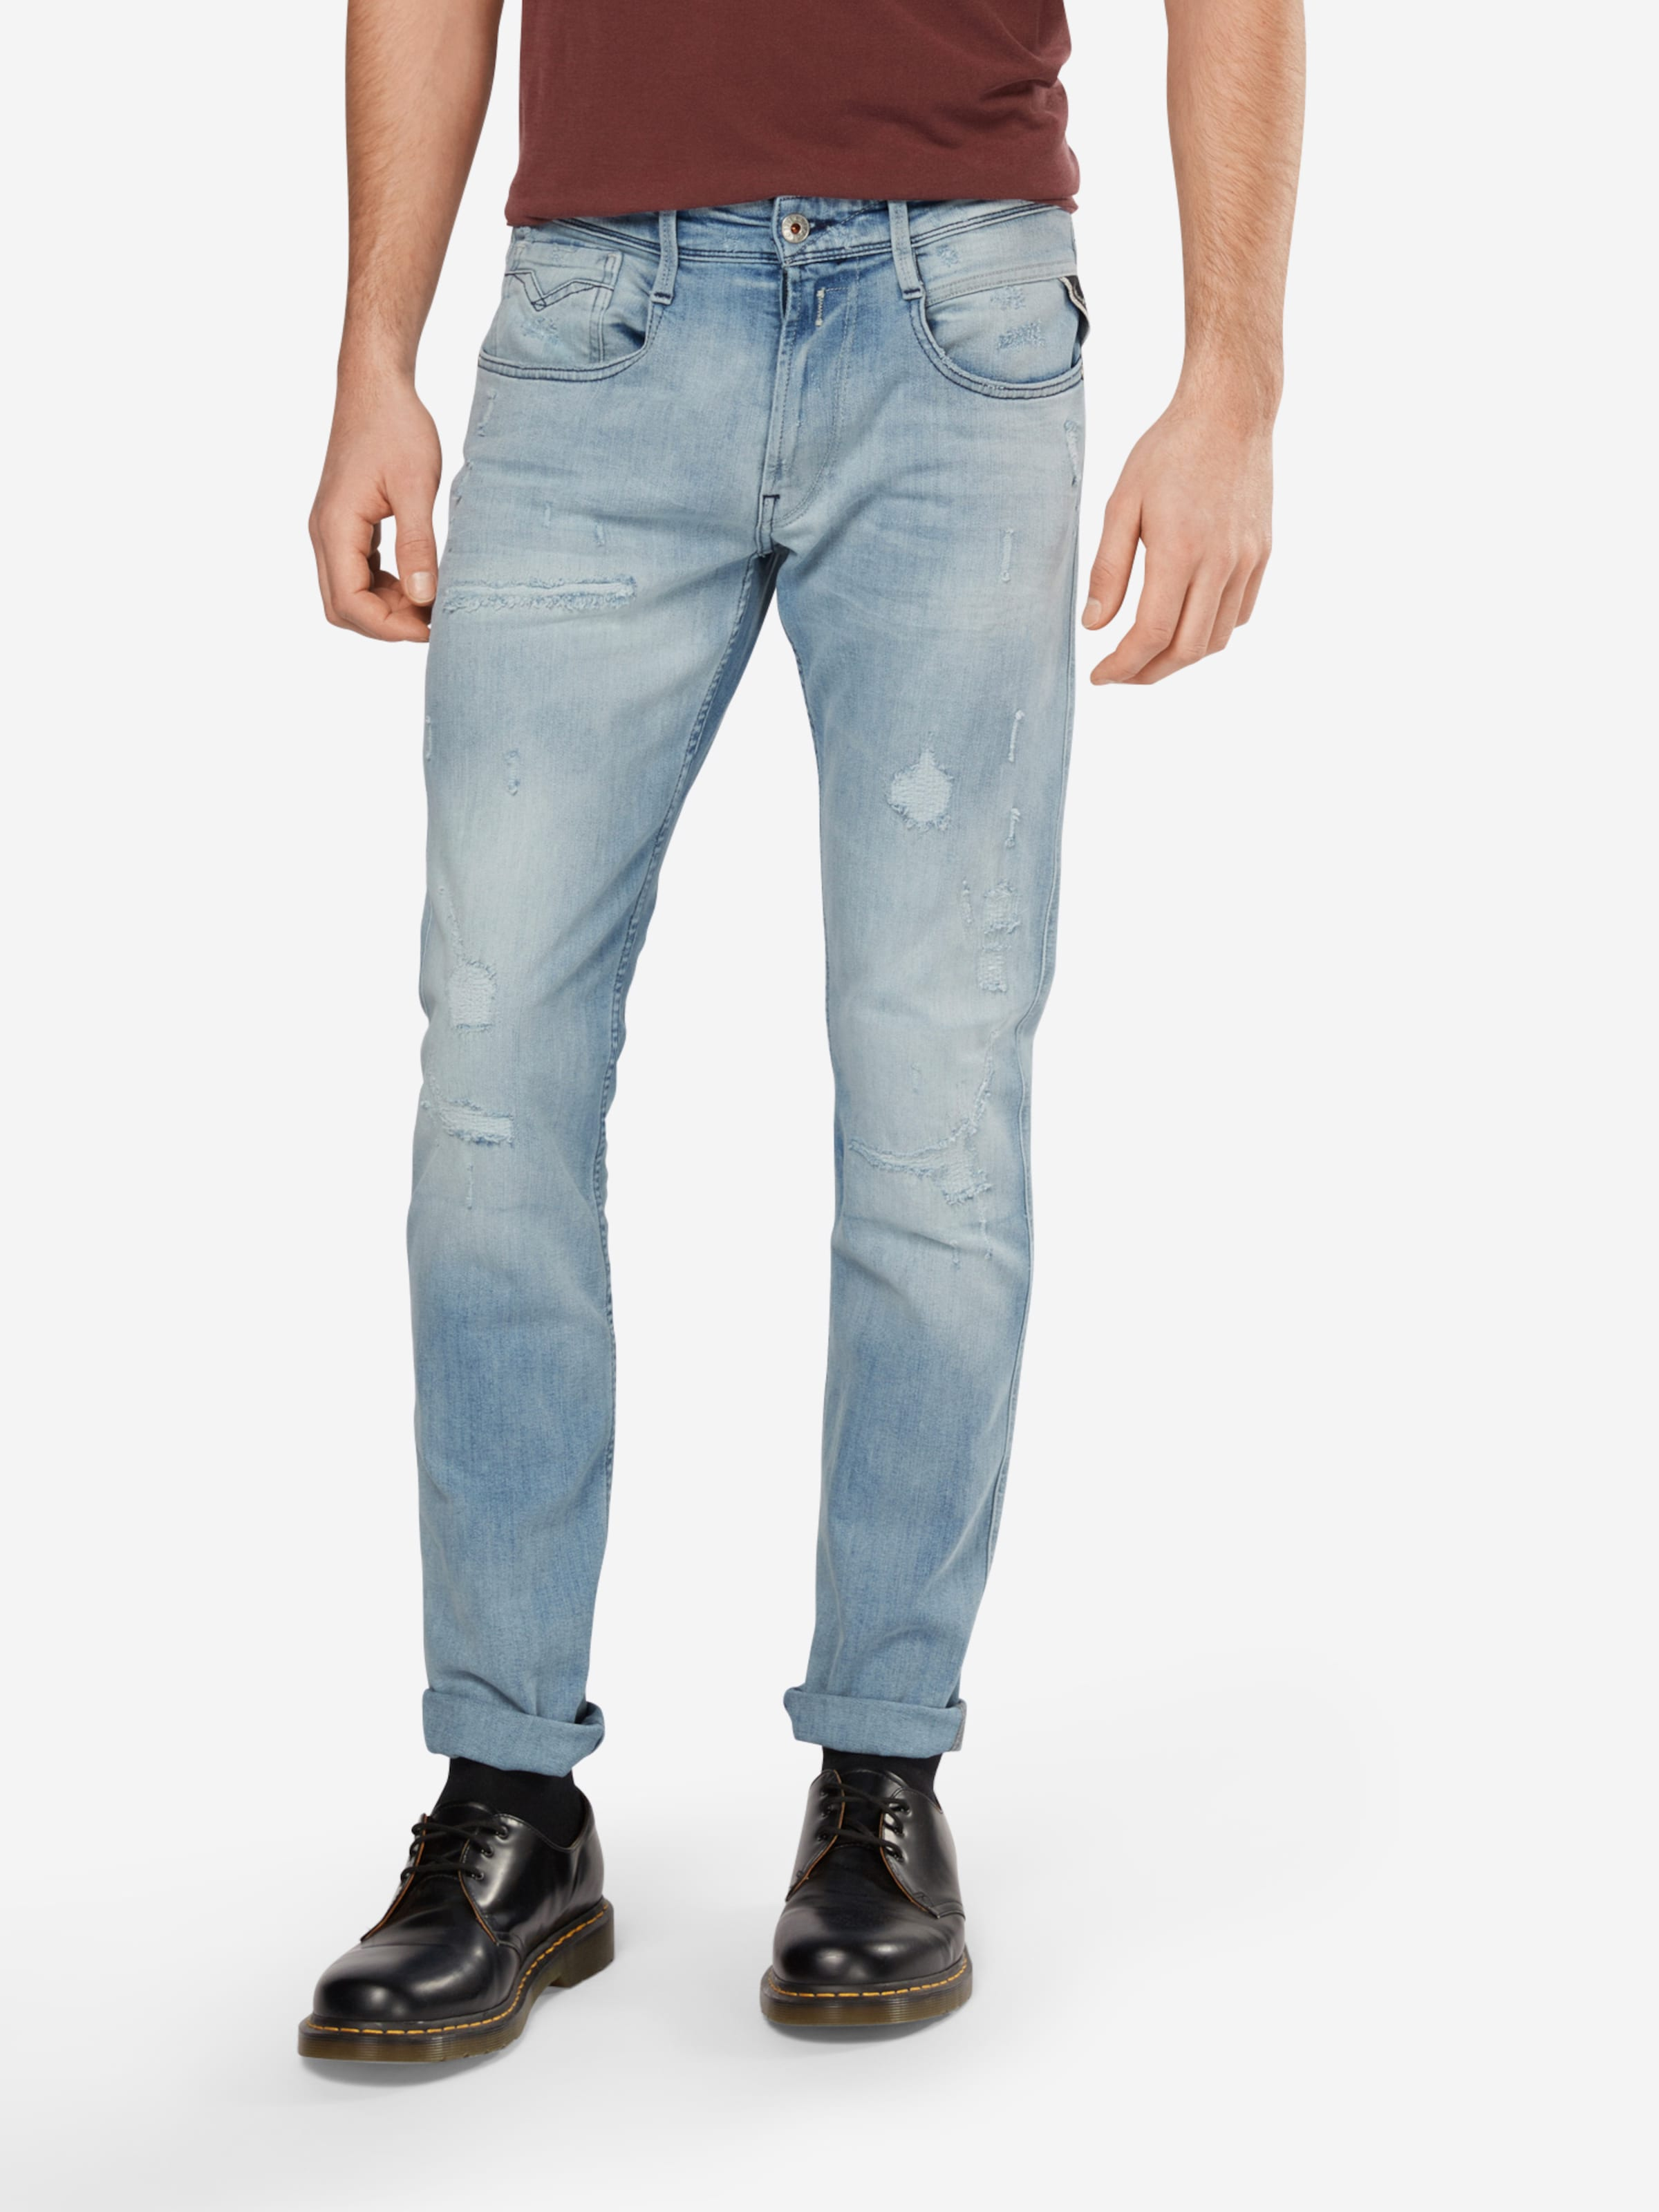 REPLAY Jeans im Used-Style 'Anbass' Auslass Original Spielraum Angebote Online-Verkauf Offiziell Footlocker Online Bx7mfb